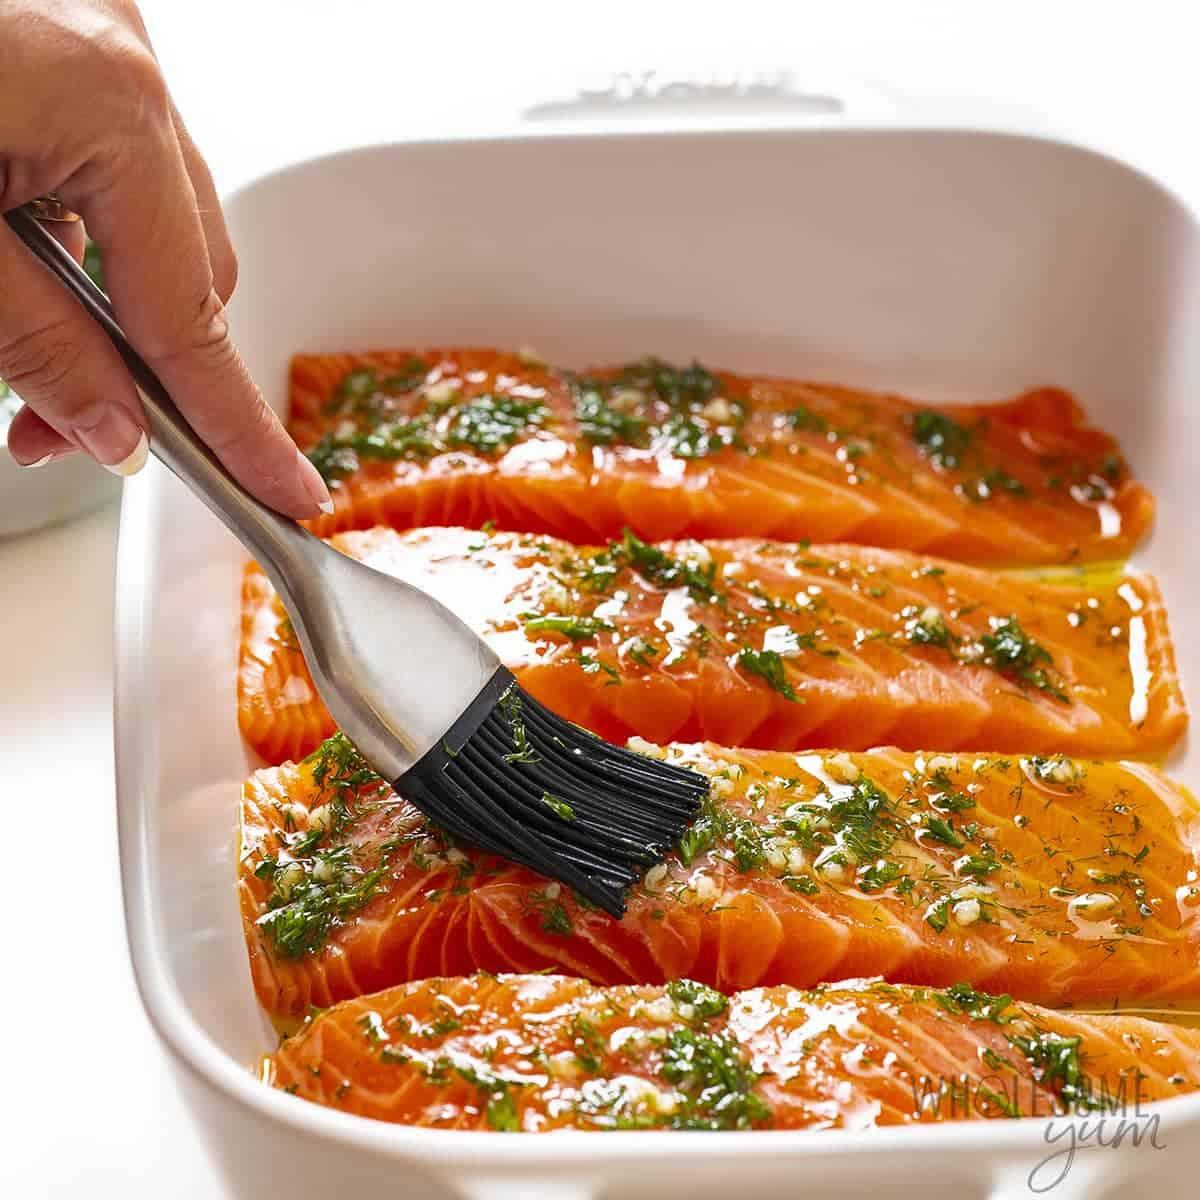 Brushing olive oil mixture on salmon